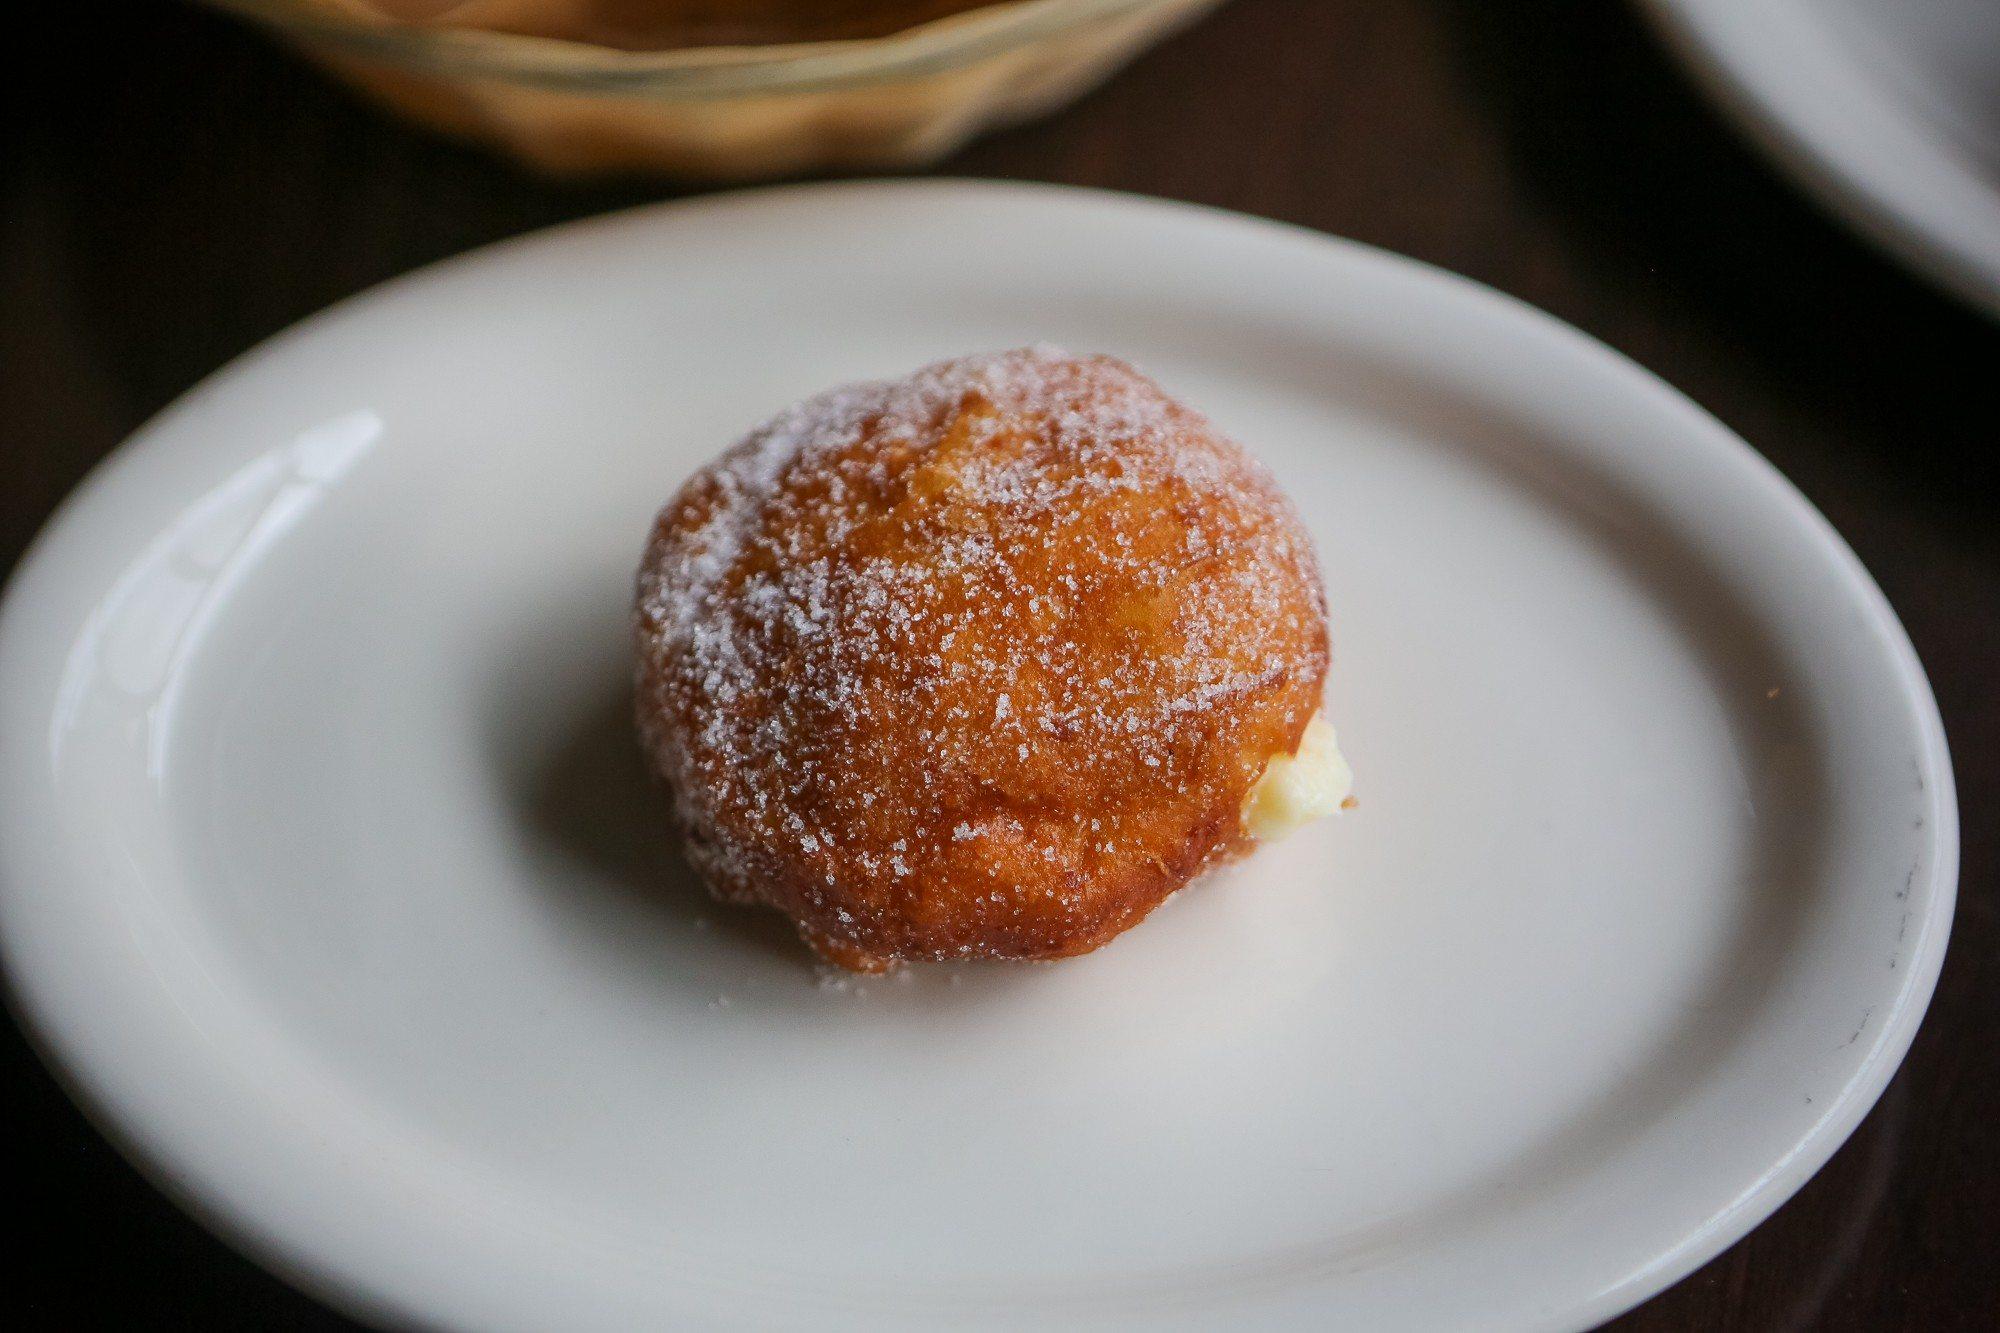 toronto-restaurants-chefs-in-the-burbs-bashir-munye-somali-rexdale-xawaash-graffe-doughnut